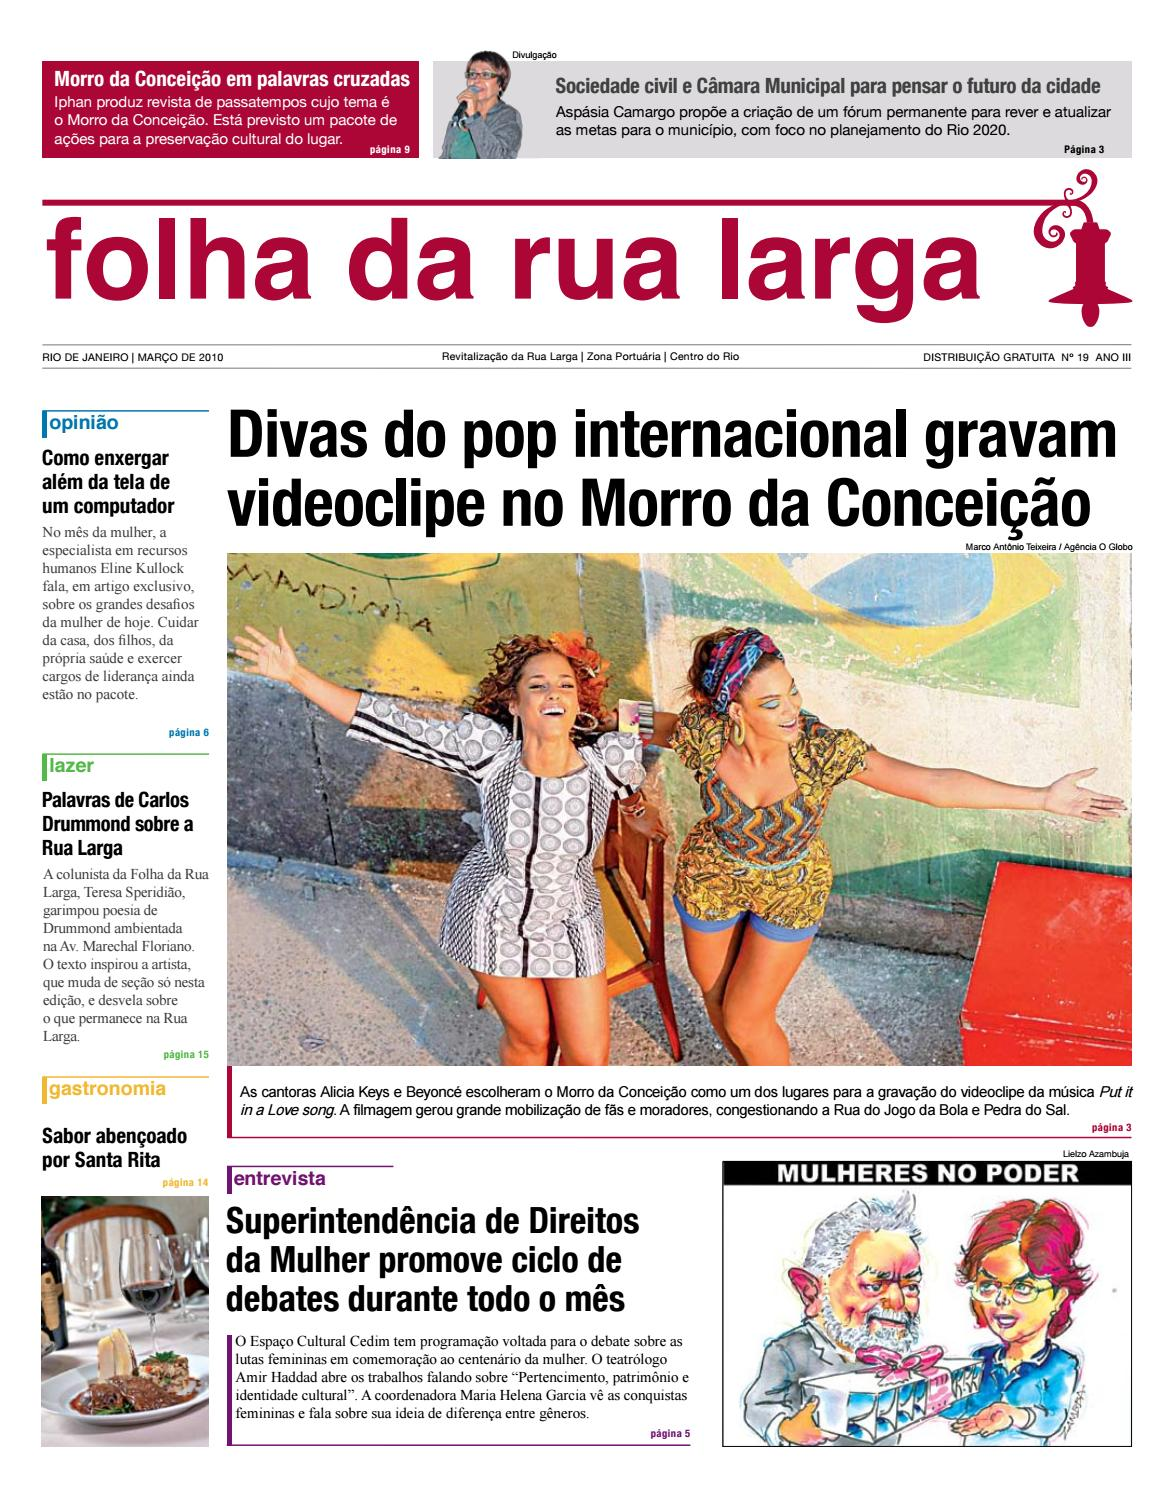 8db4bebe913 Folha da Rua Larga Ed.19 by Instituto Cultural Cidade Viva - issuu